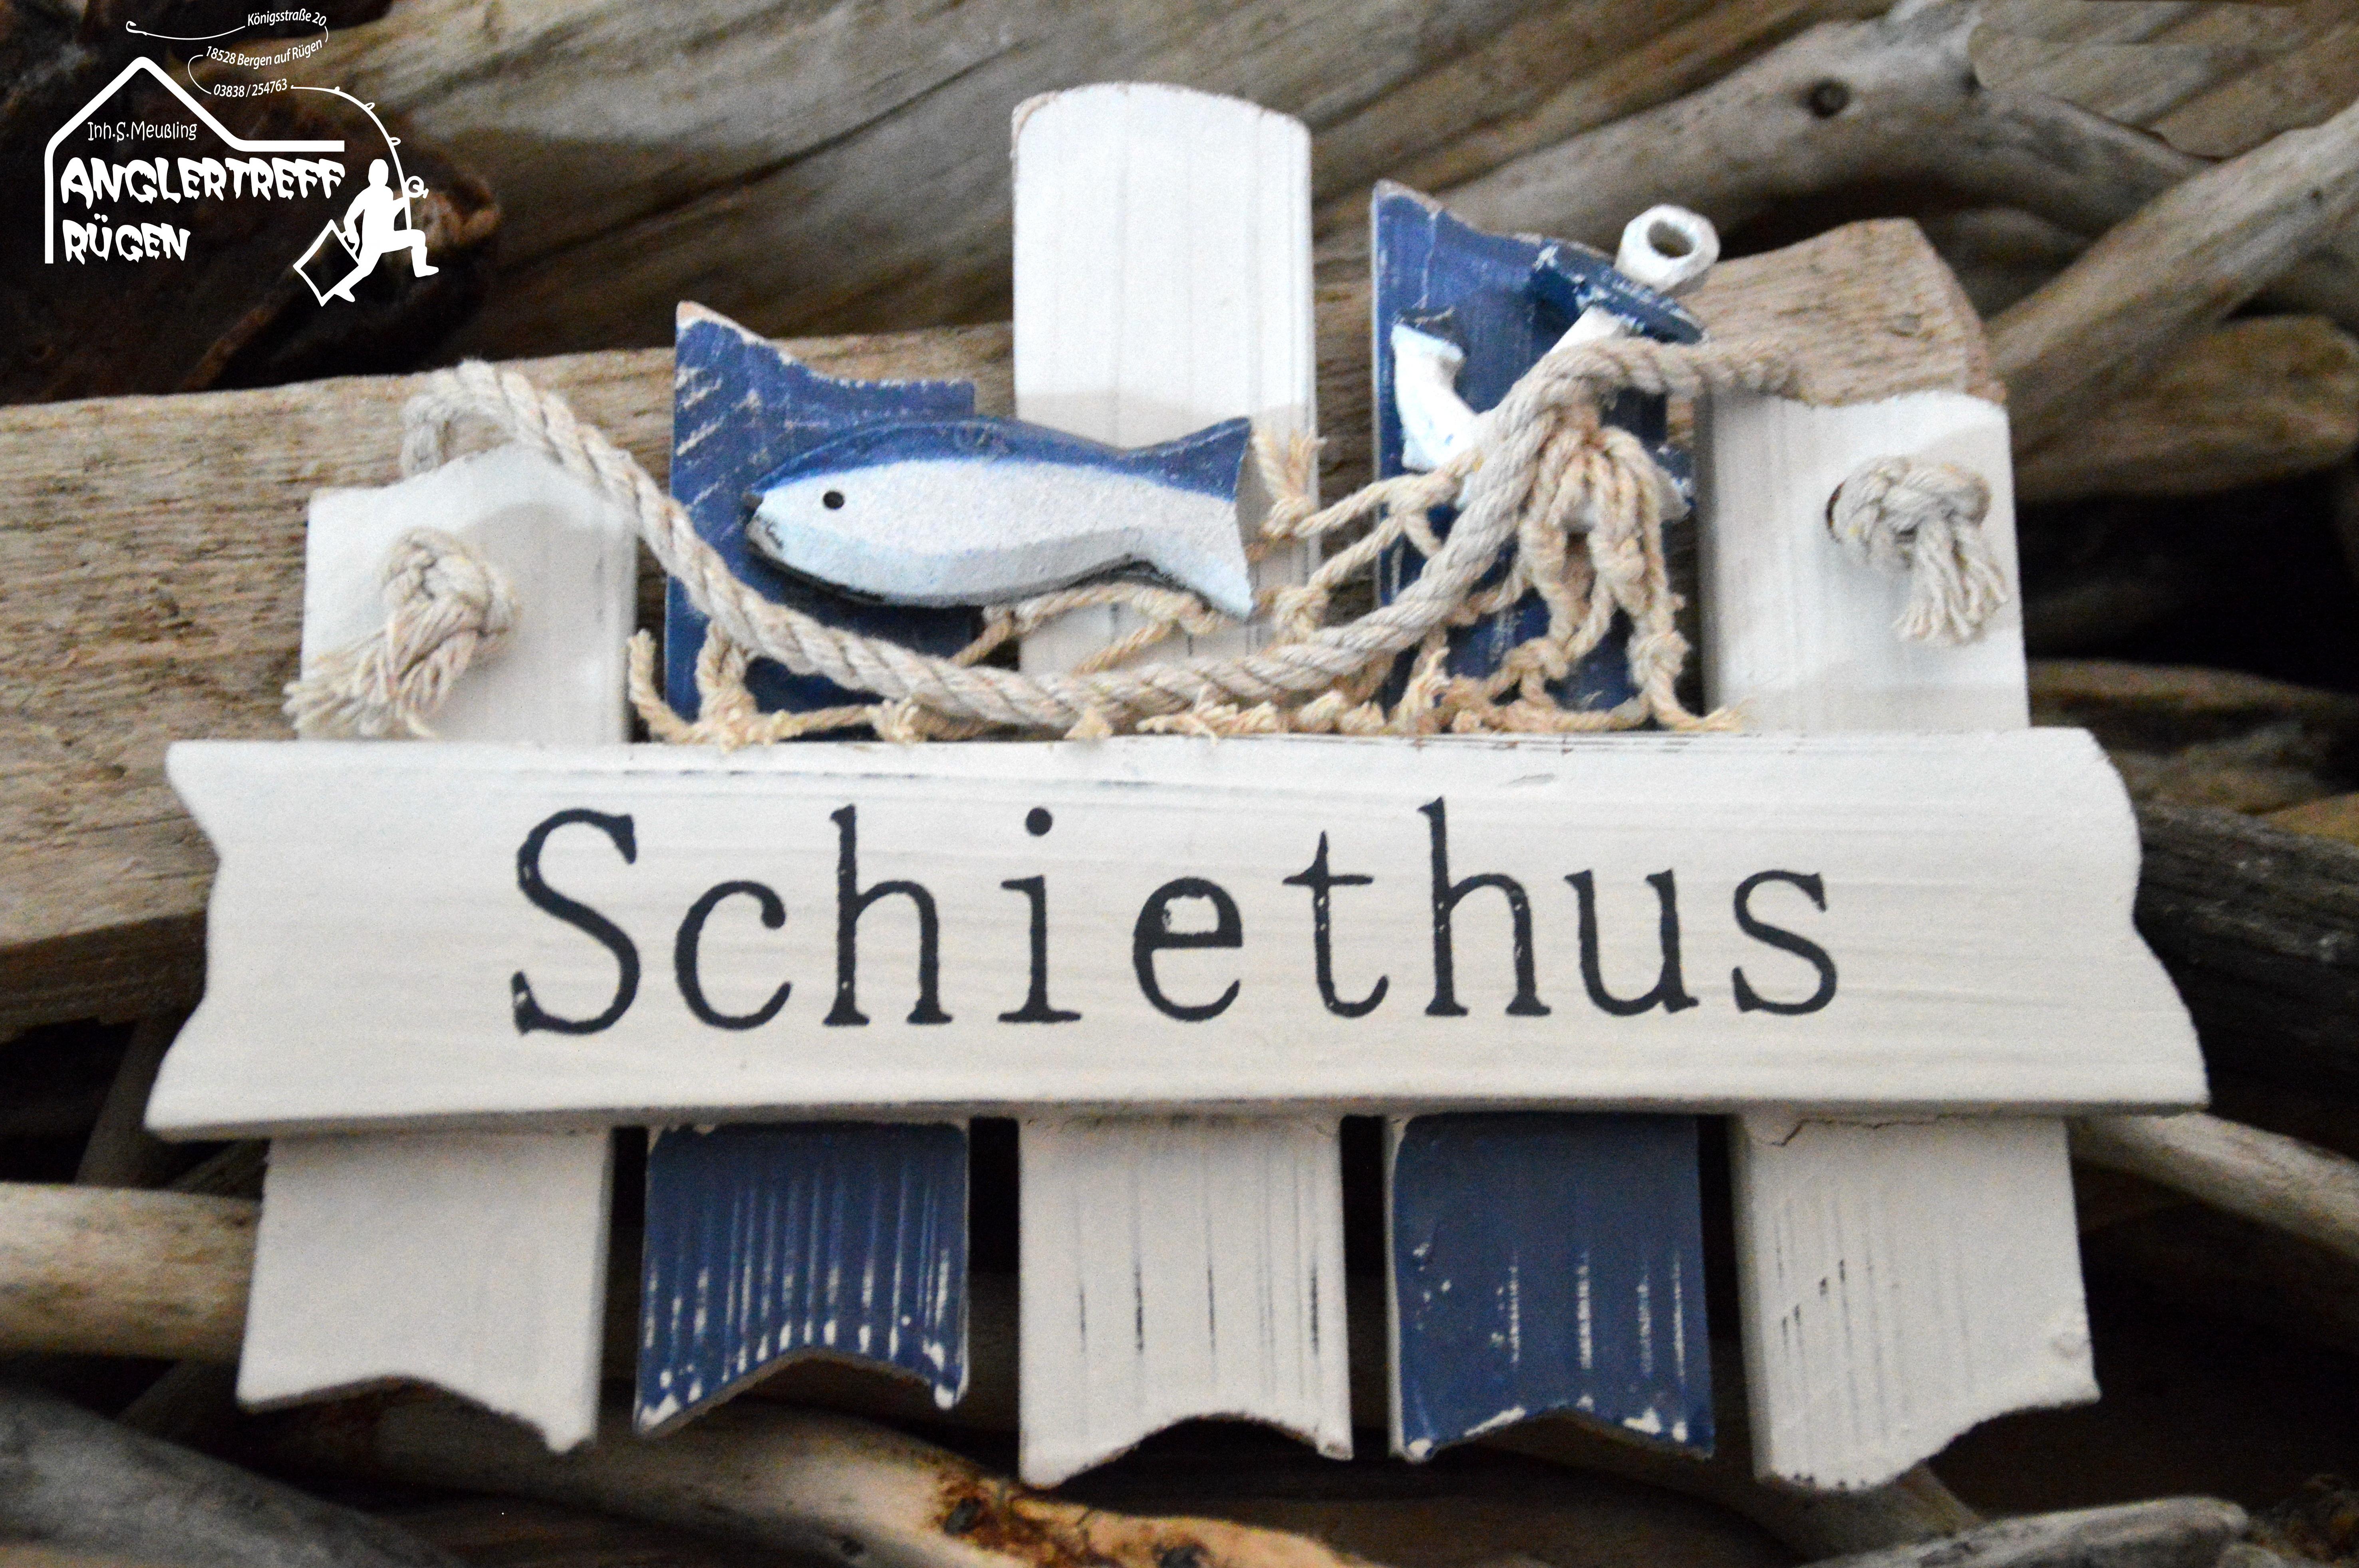 anglertreff r gen schiethus maritime deko deko schild online kaufen. Black Bedroom Furniture Sets. Home Design Ideas